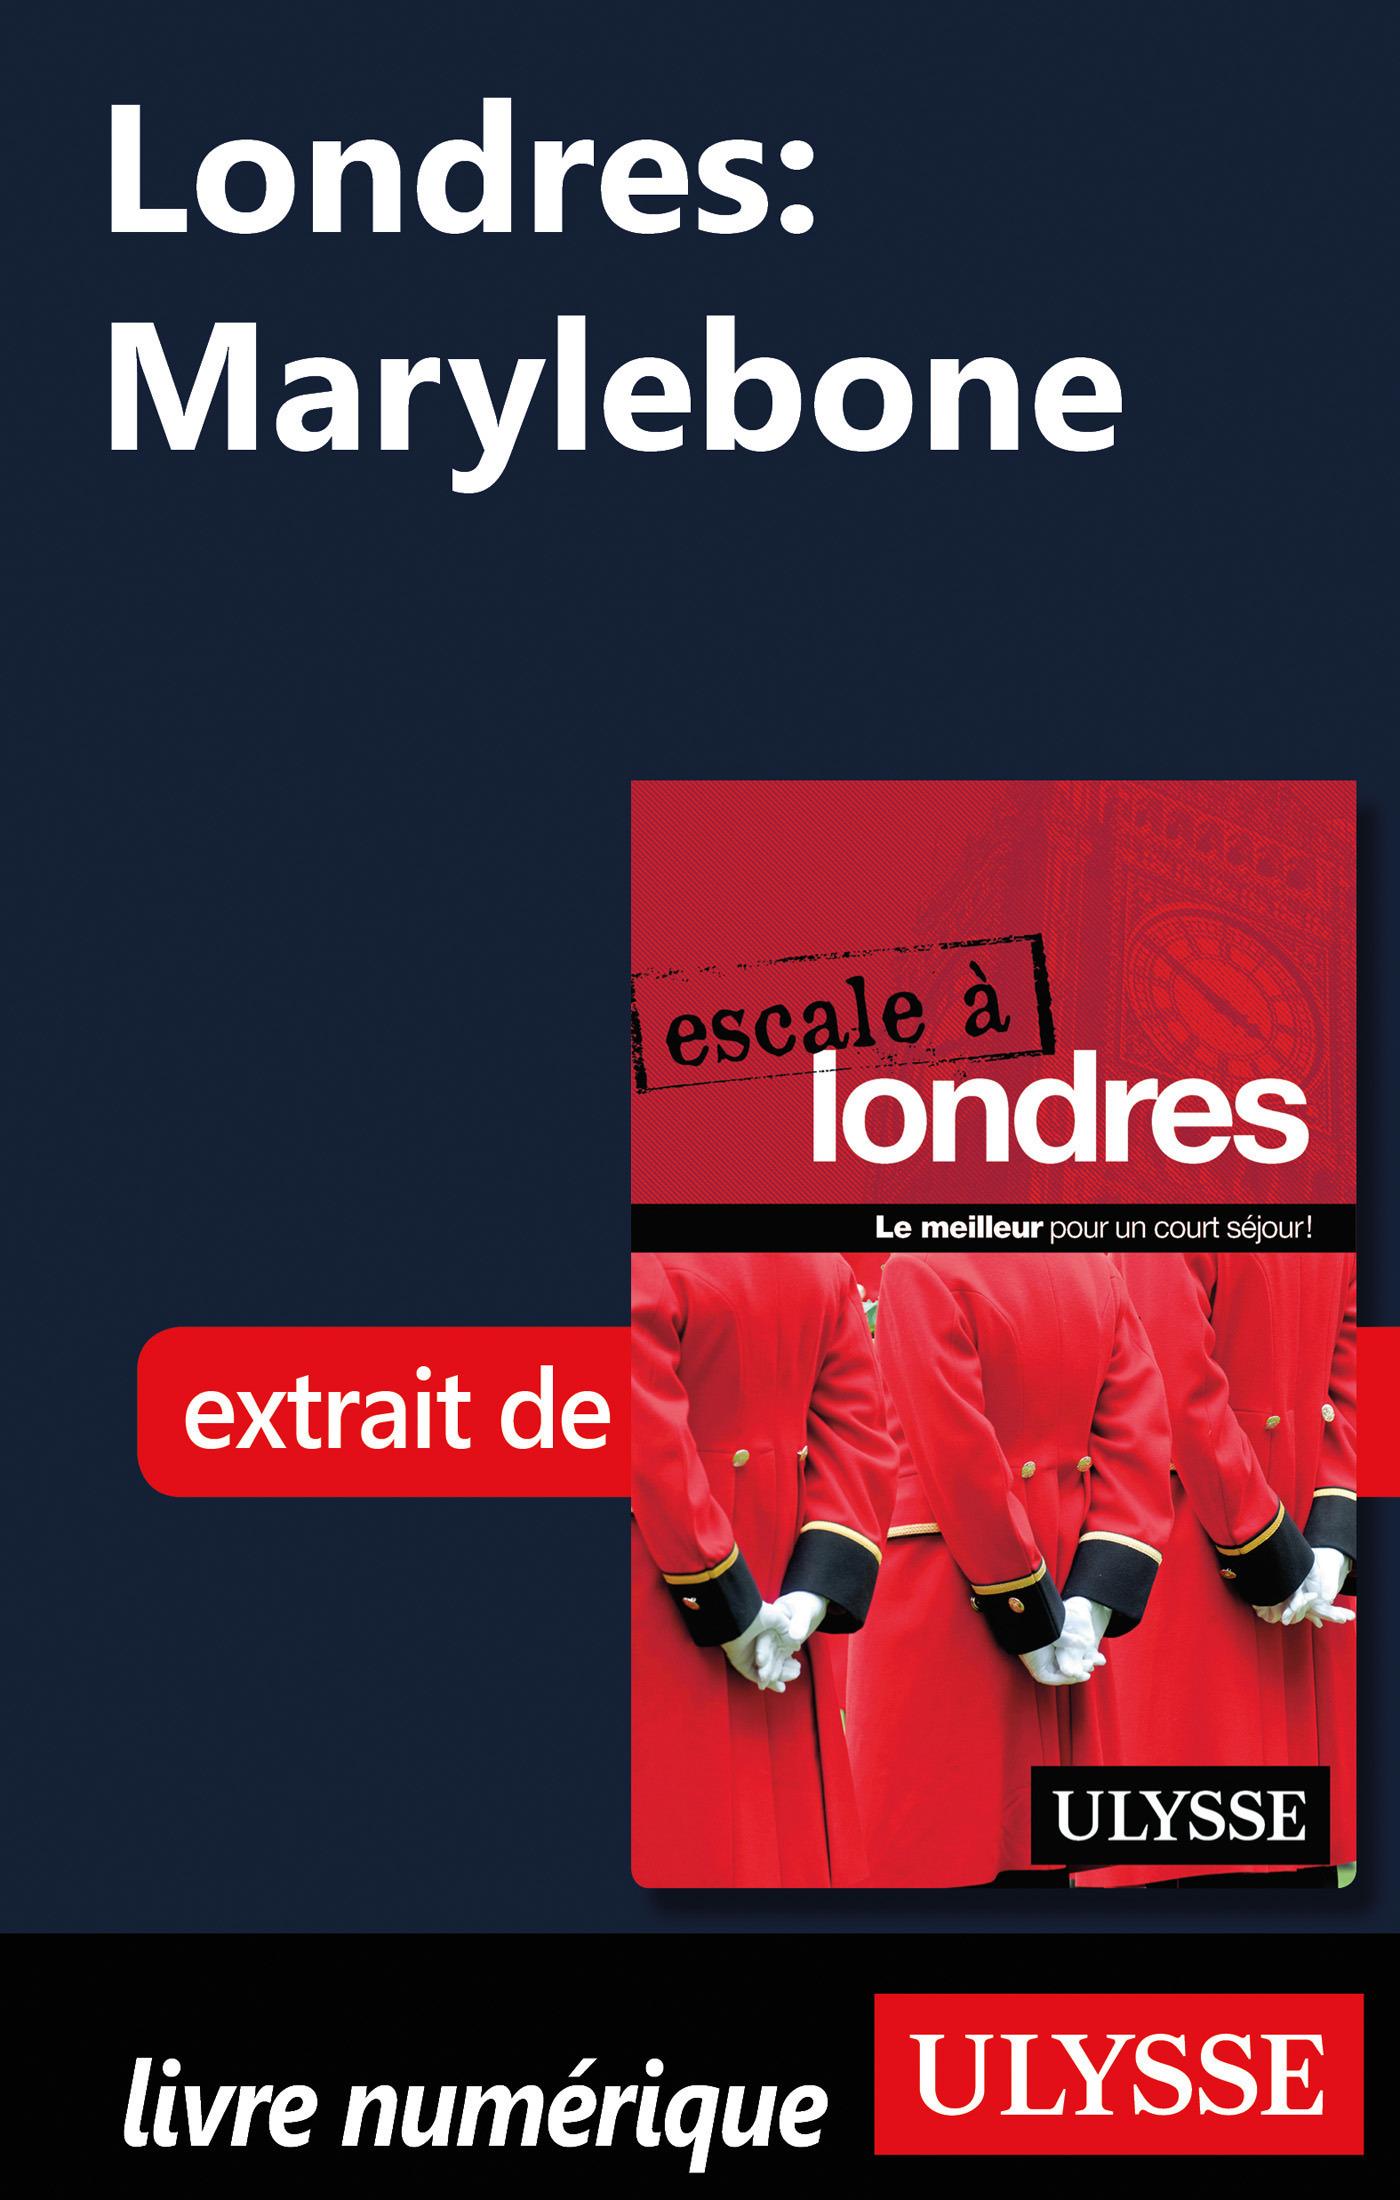 Londres : Marylebone